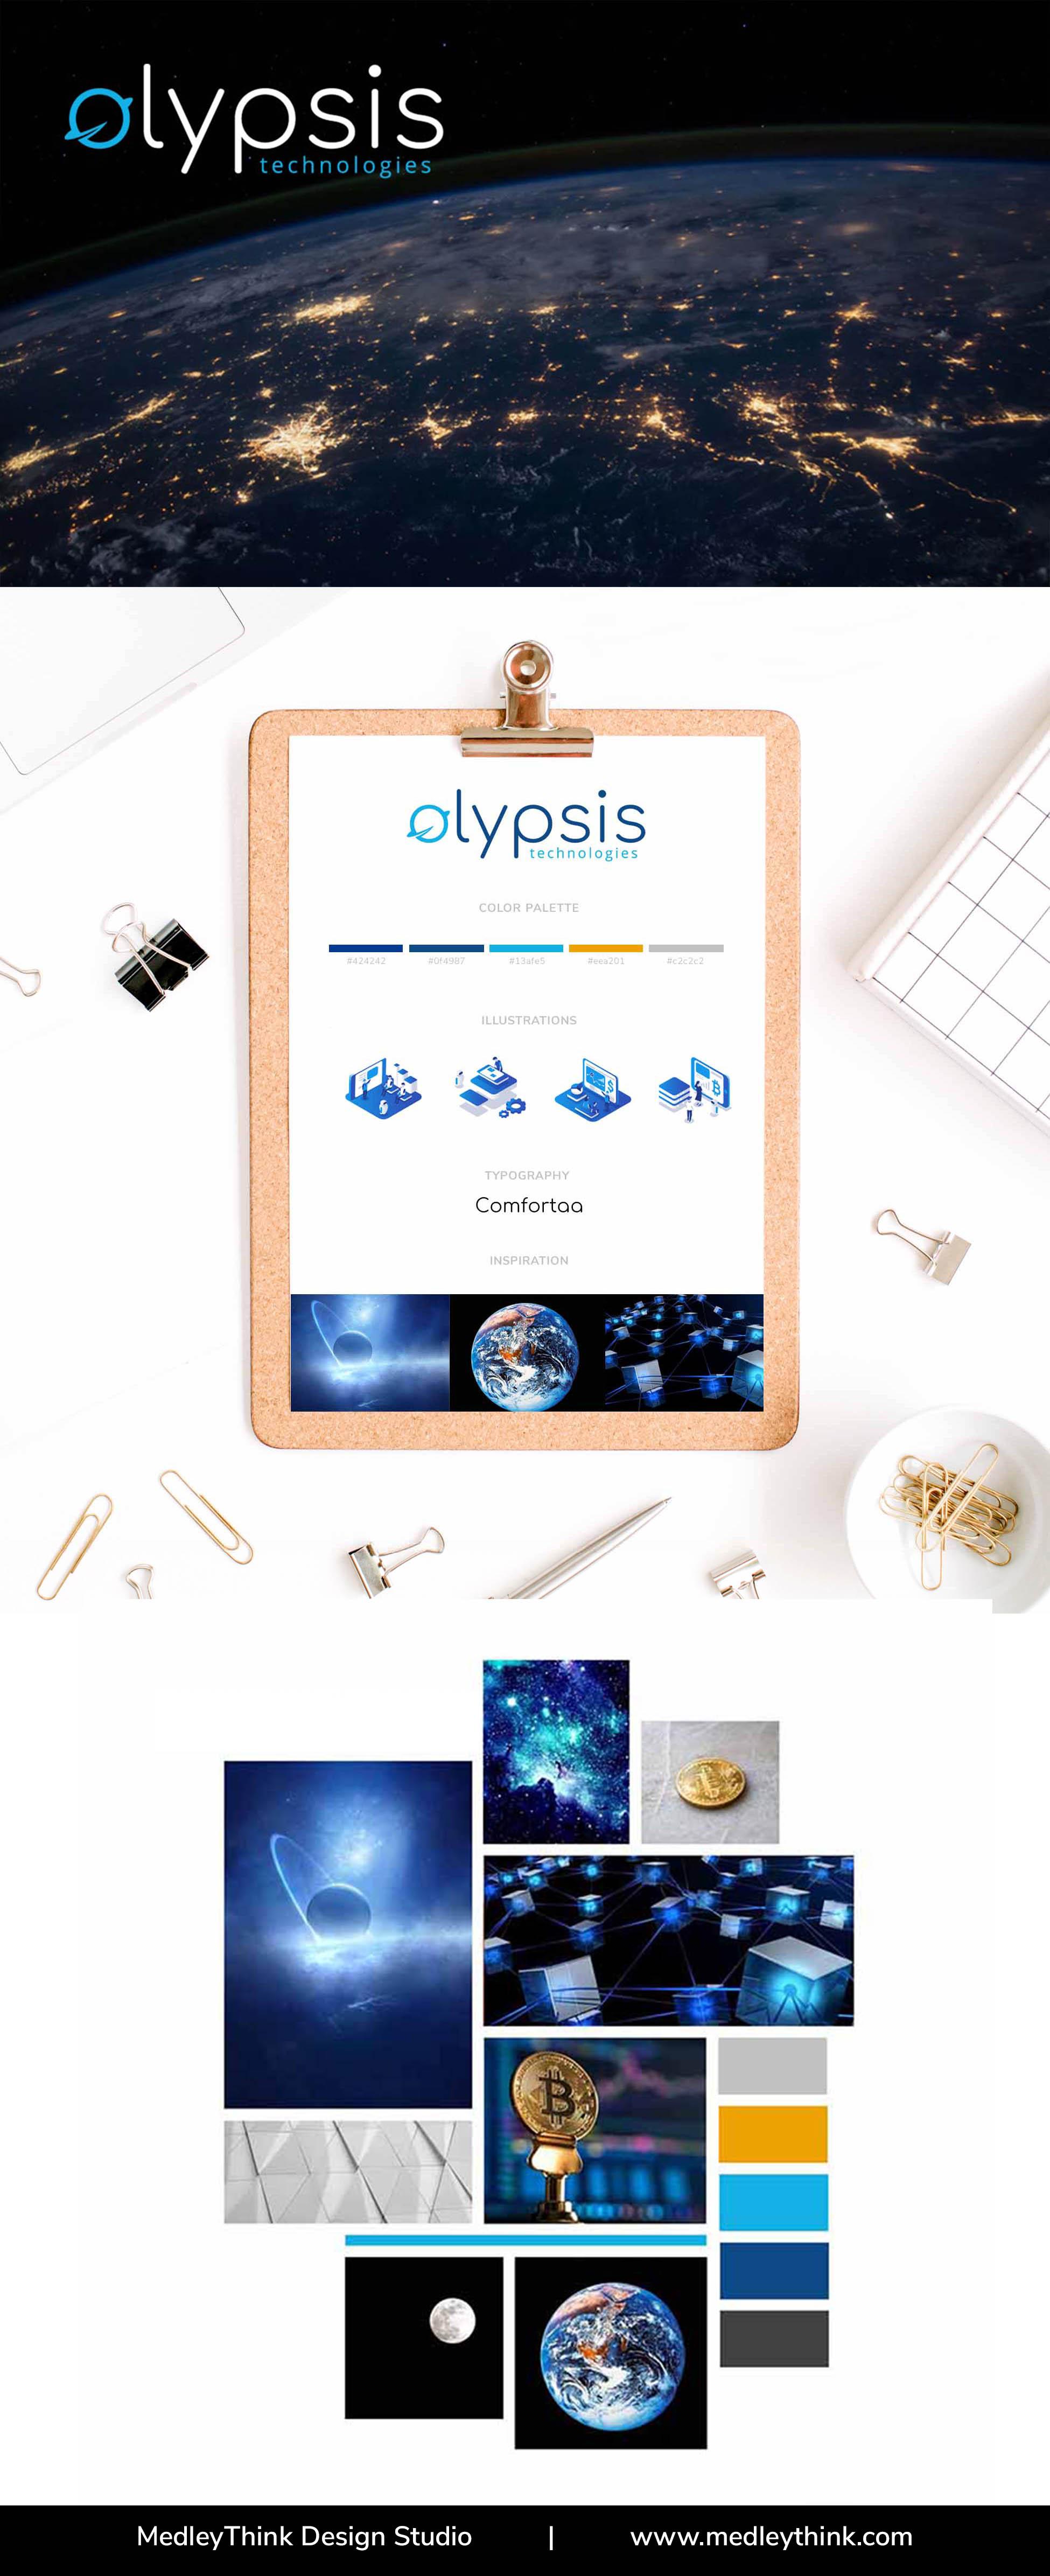 Olypsis Blockchain Development